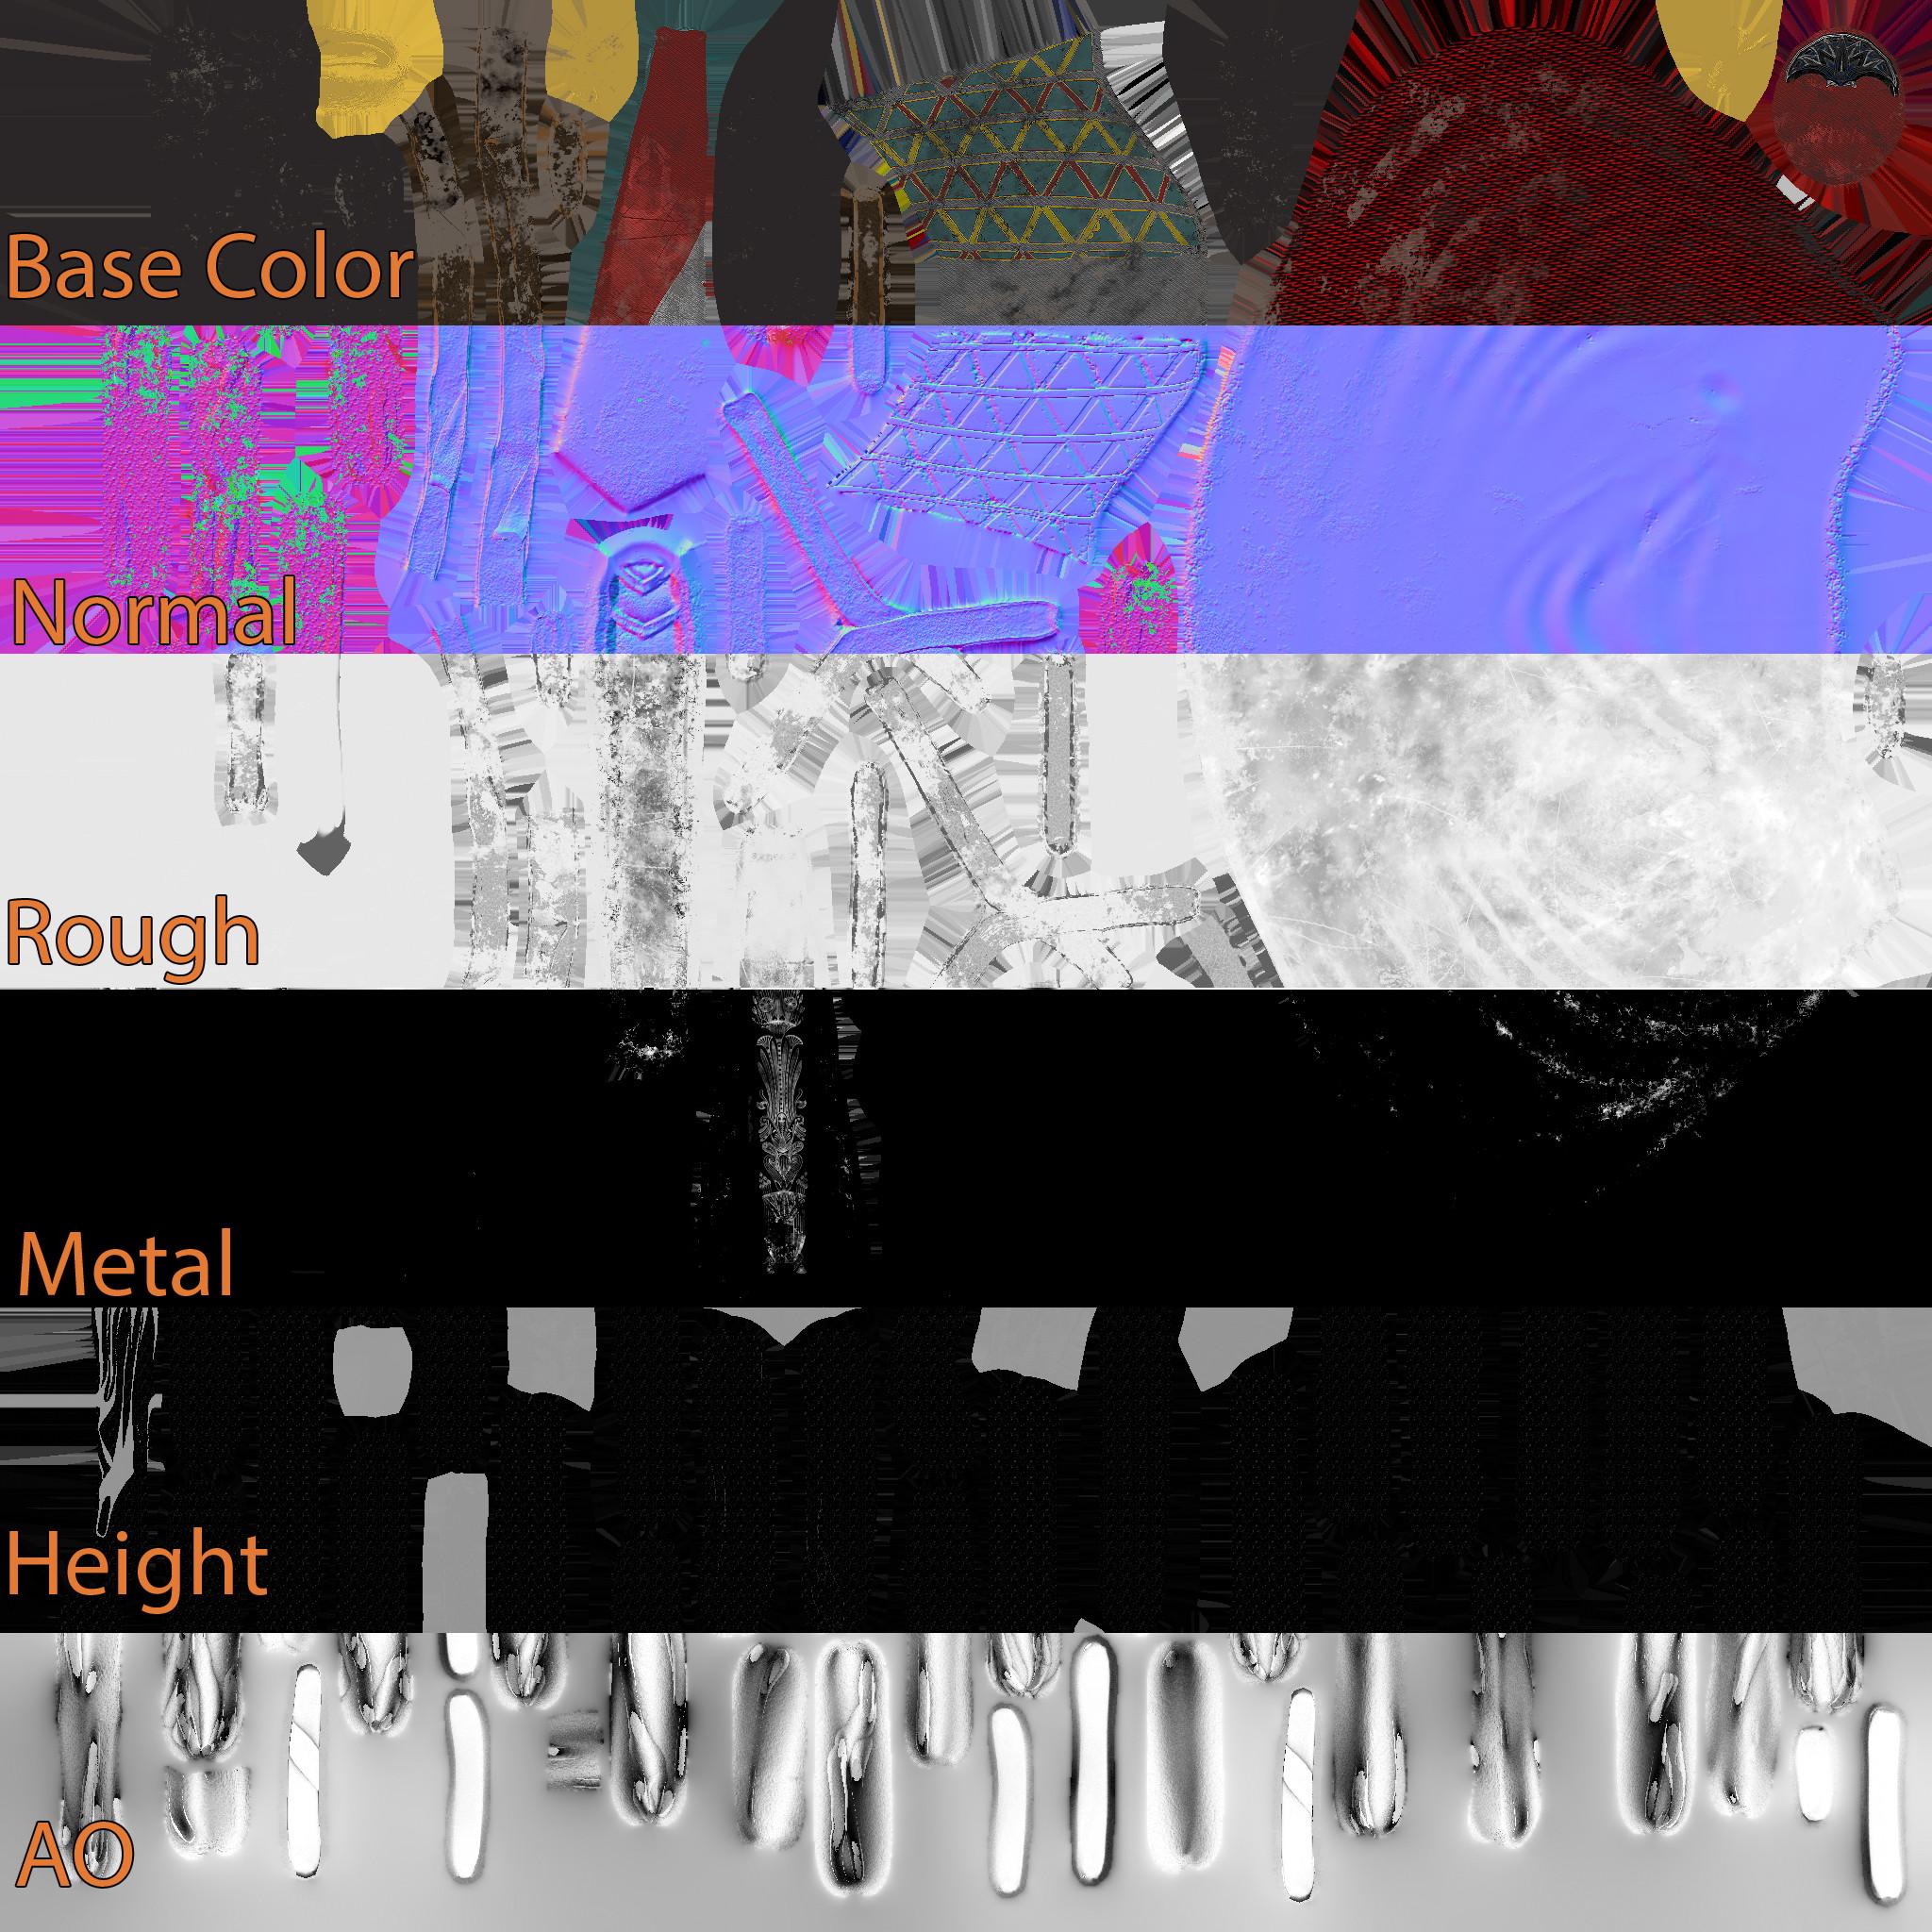 Texture sheet breakdown of the fabrics.